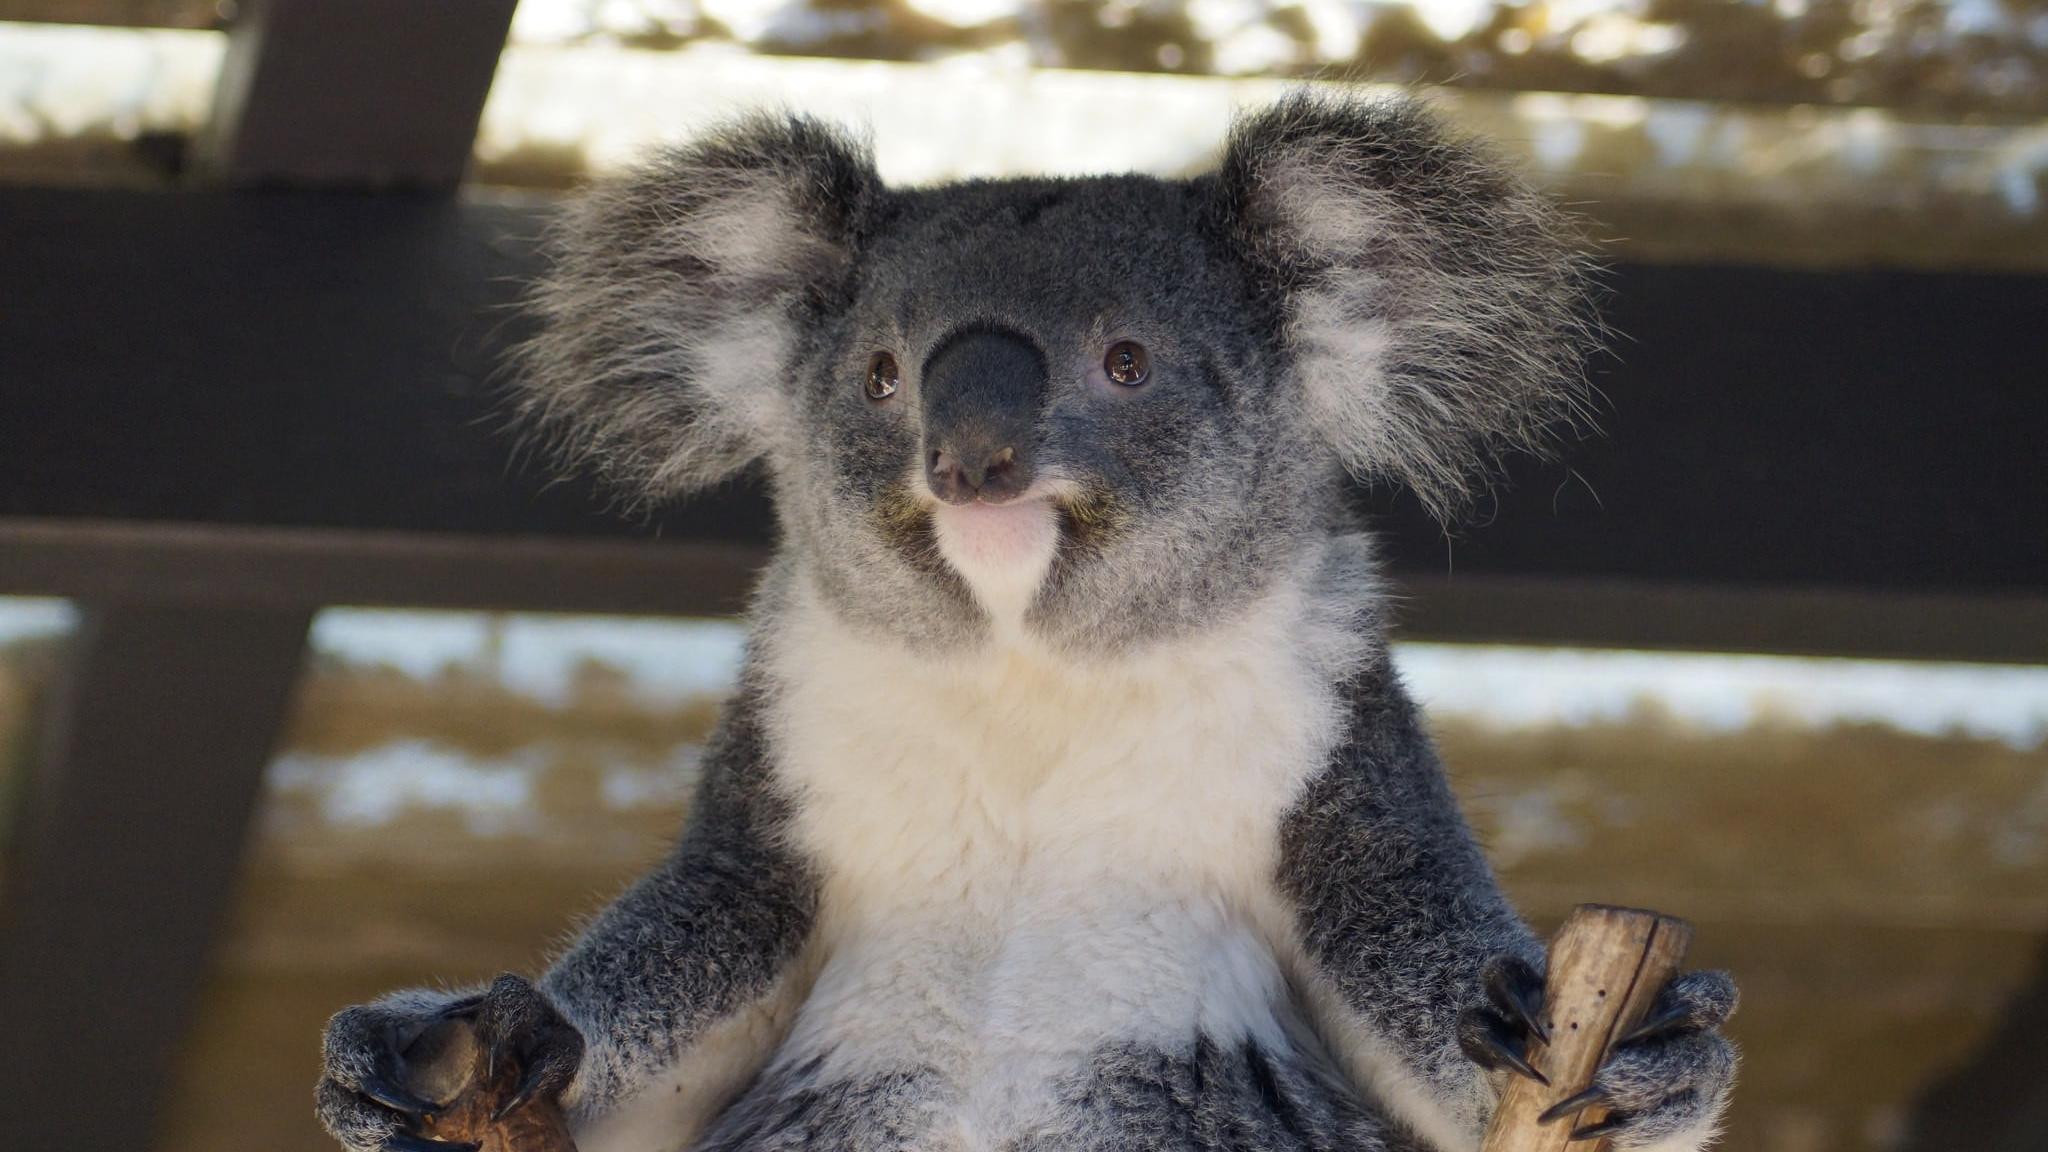 smiling koala picture - HD2048×1152